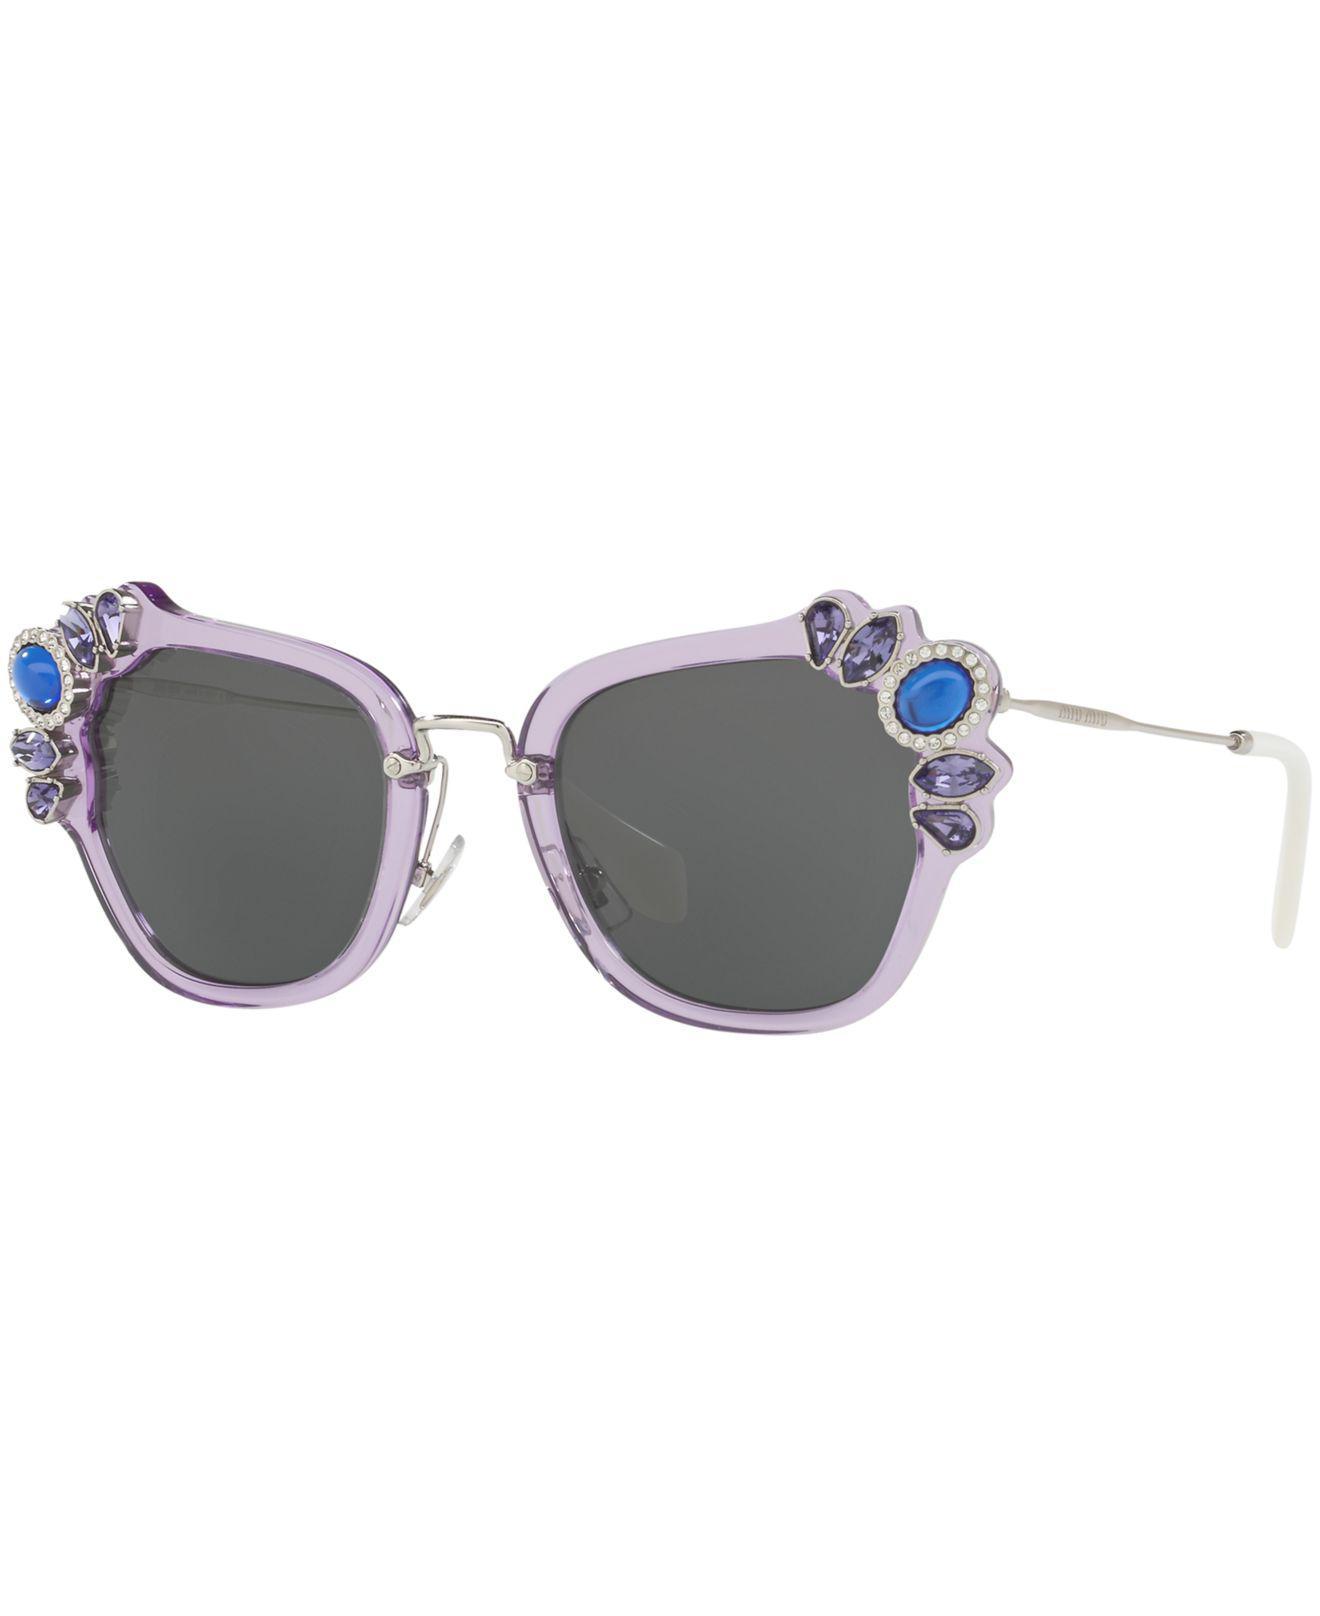 e029ff9a27f Miu Miu. Women s Gray Sunglasses ...